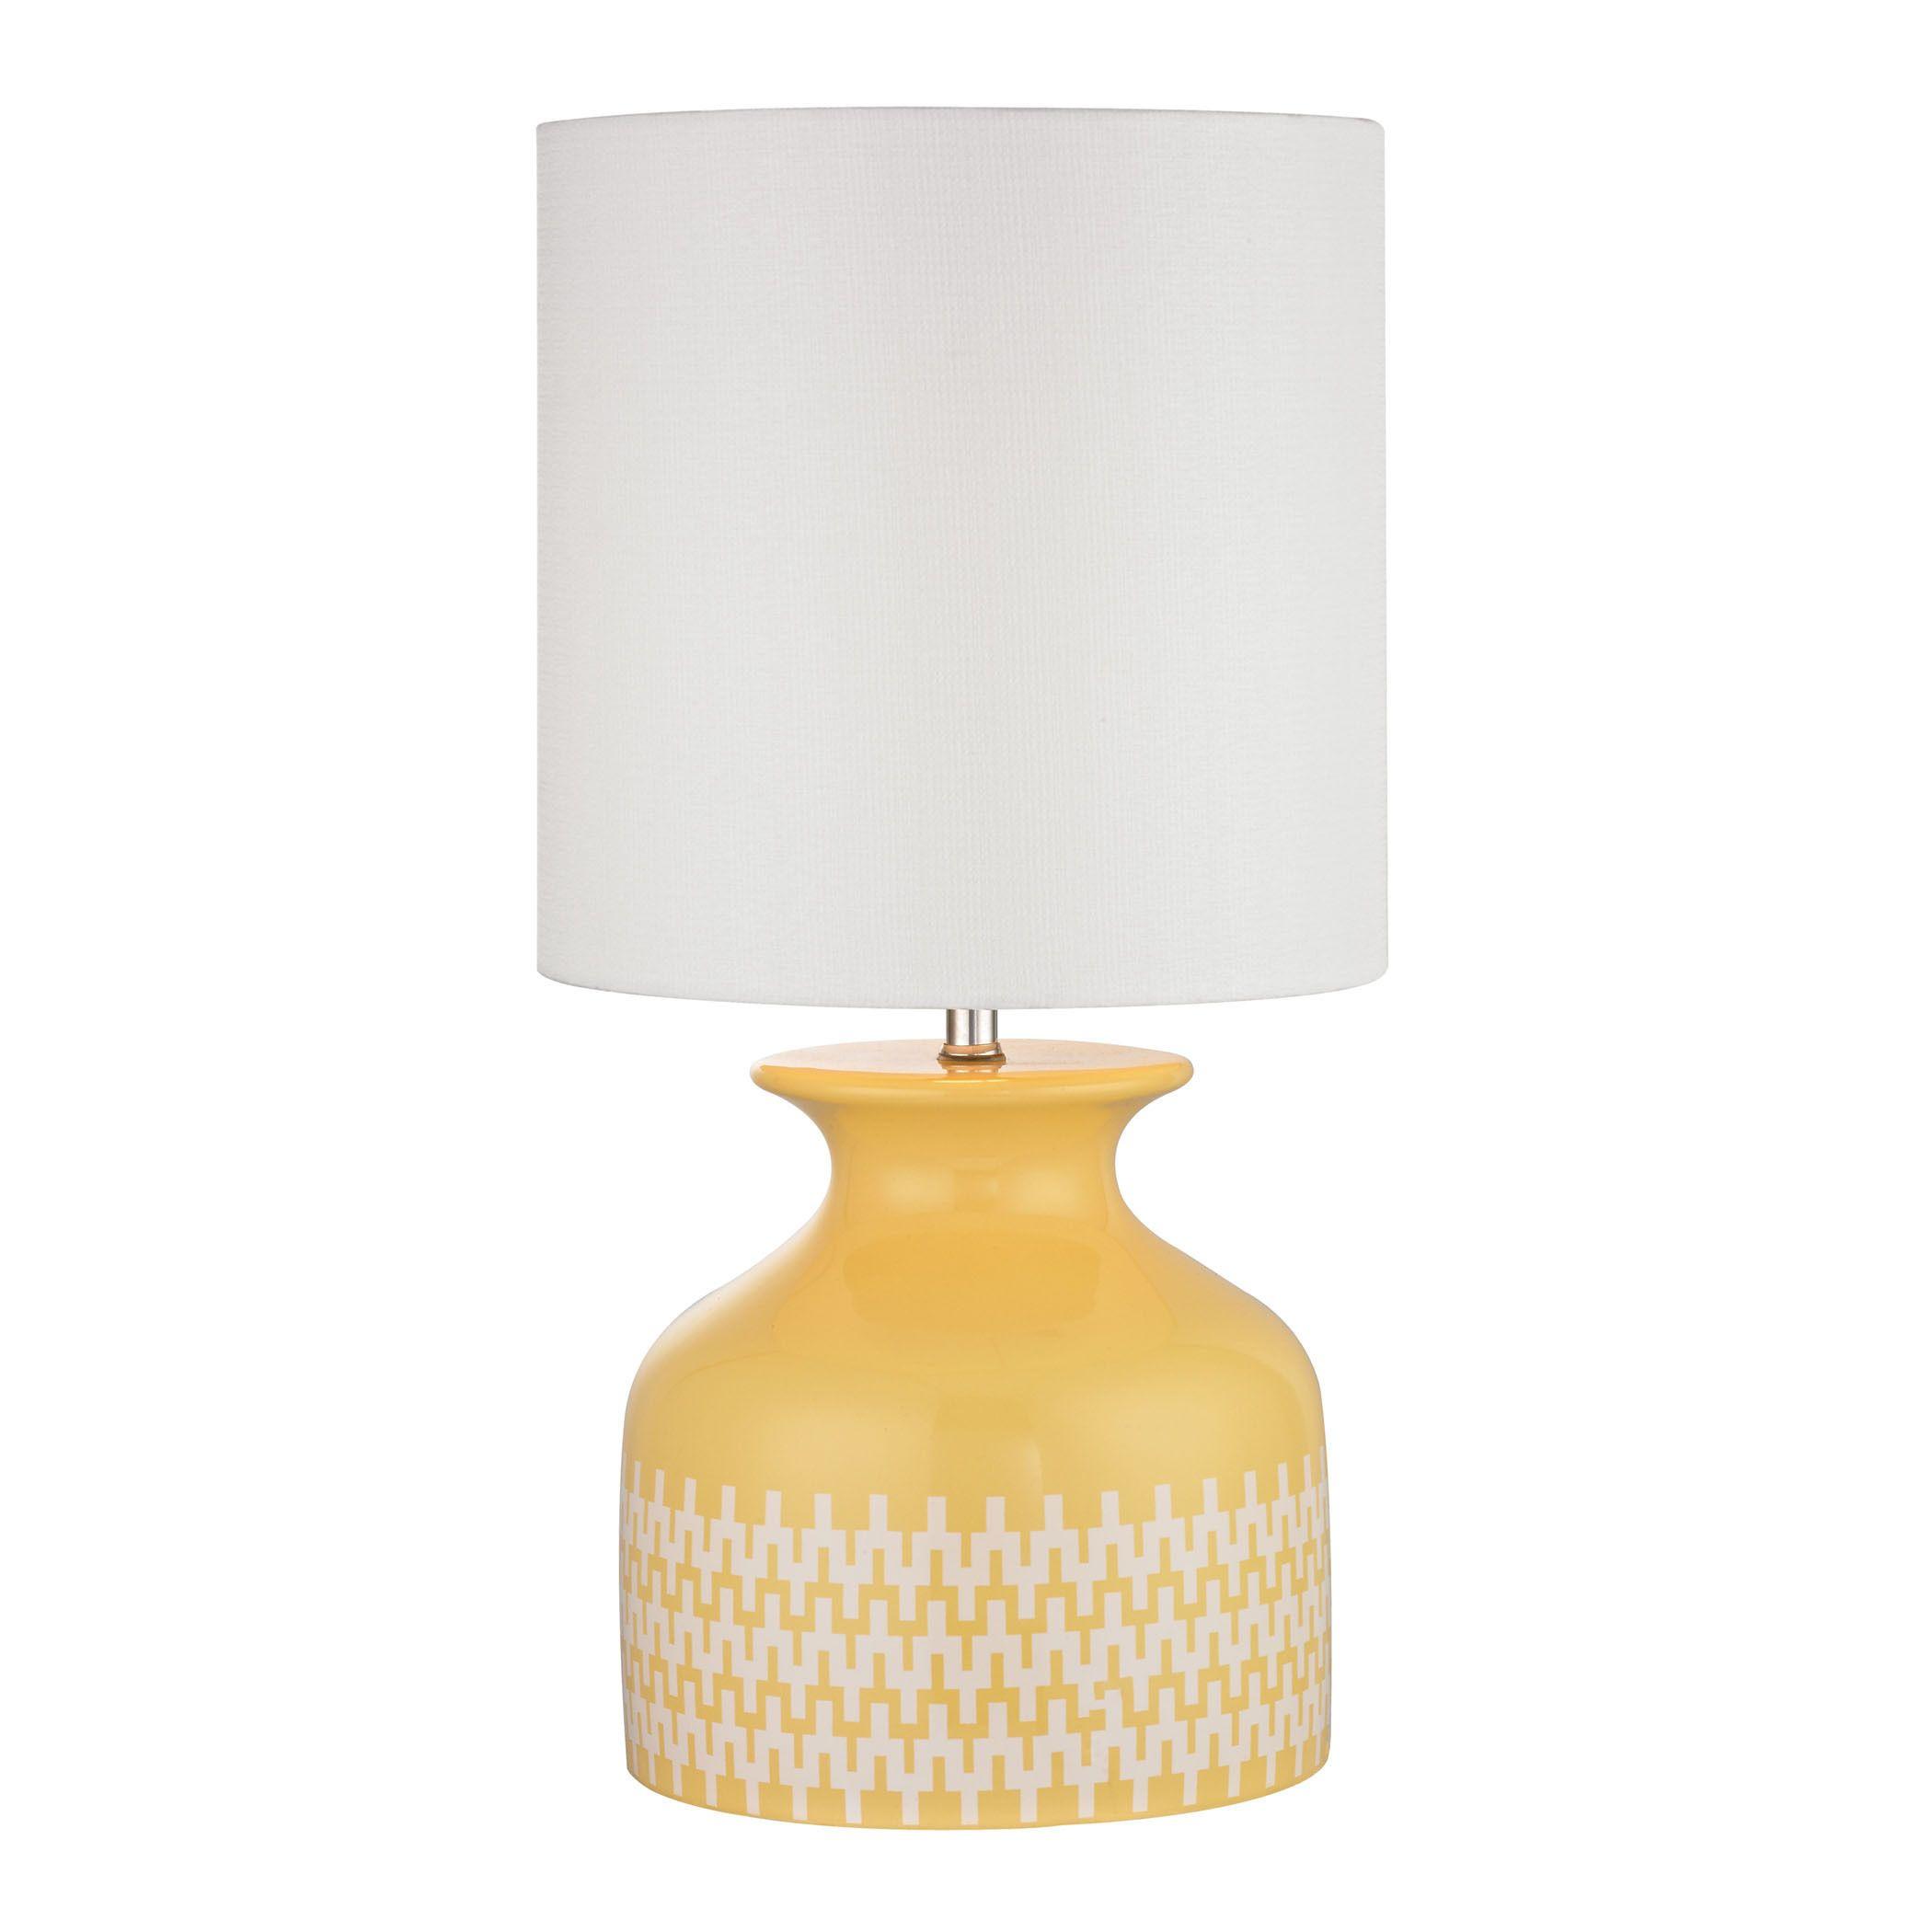 dada7182d665bf4c5bee0af87b8e5fb8 Spannende Led Lampe 100 Watt Dekorationen